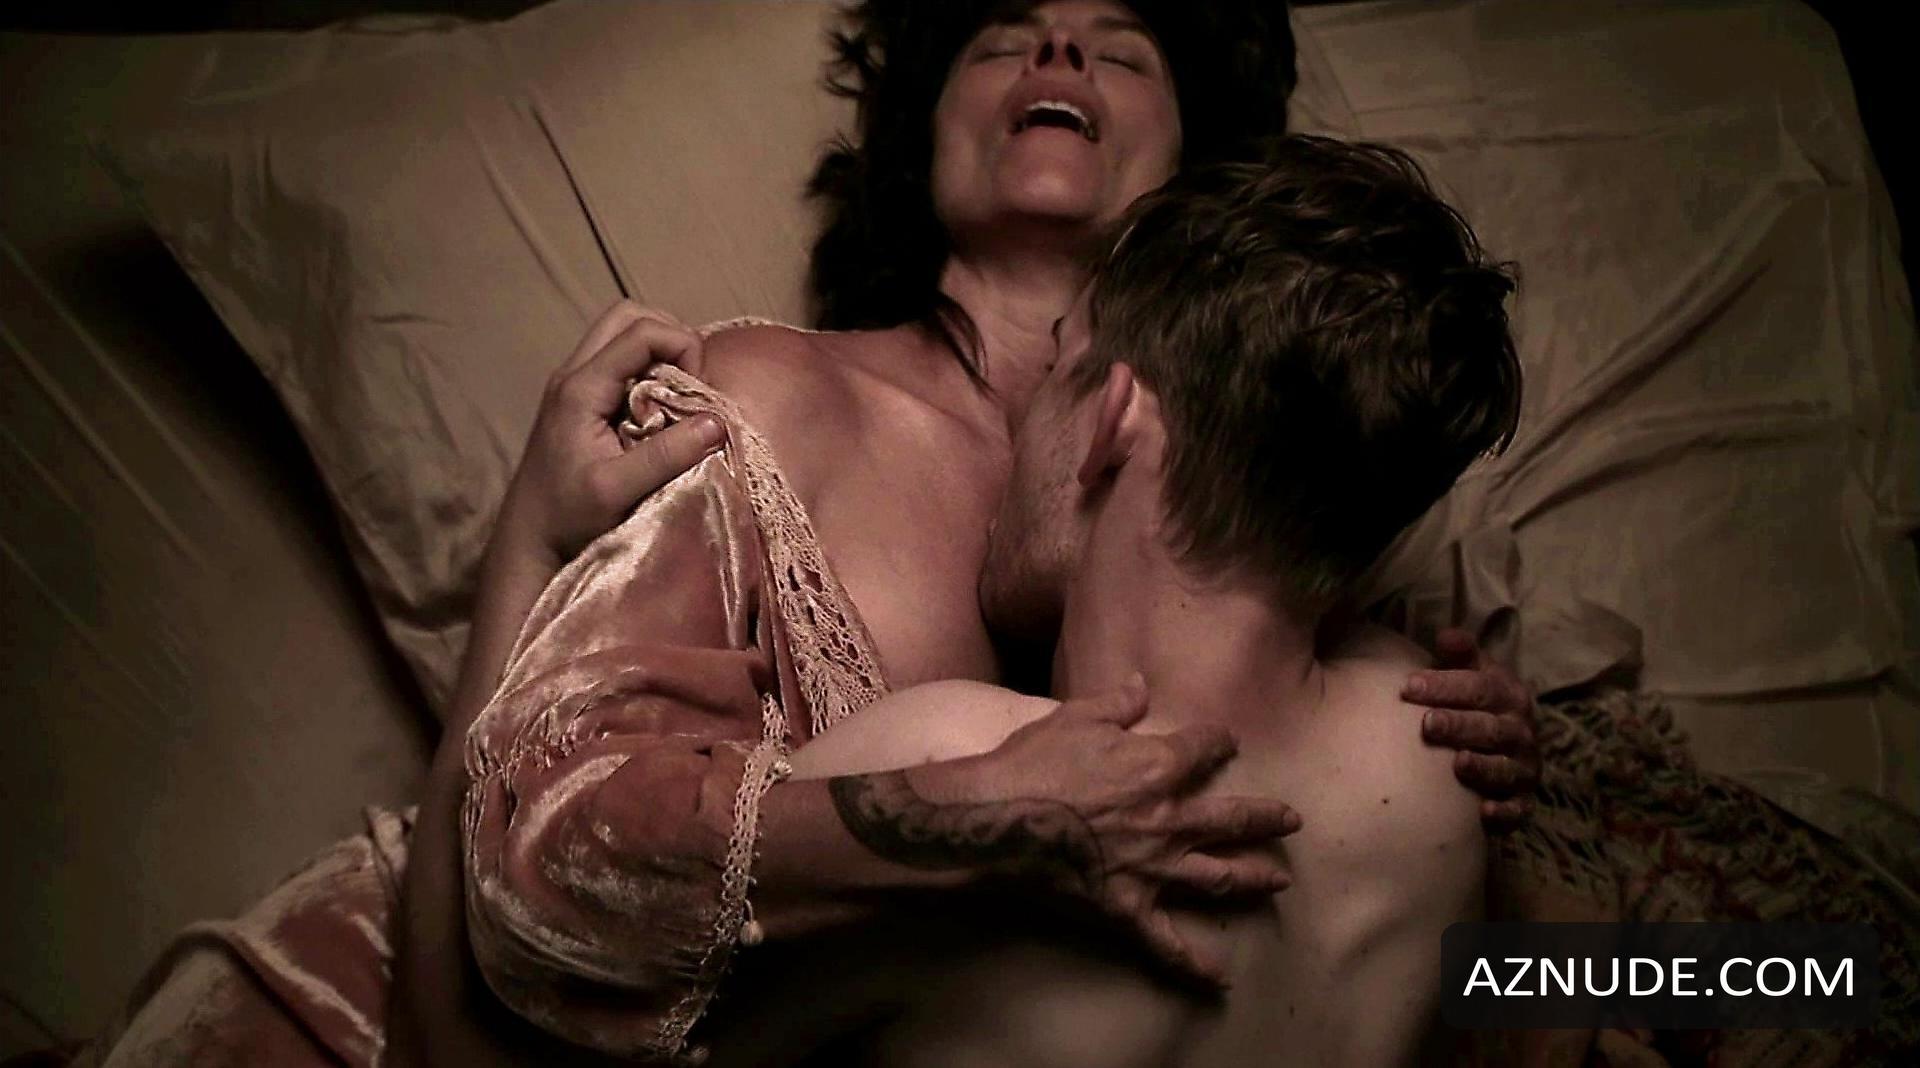 Carol Wayne Nude Photos Cheap adrienne barbeau nude - aznude